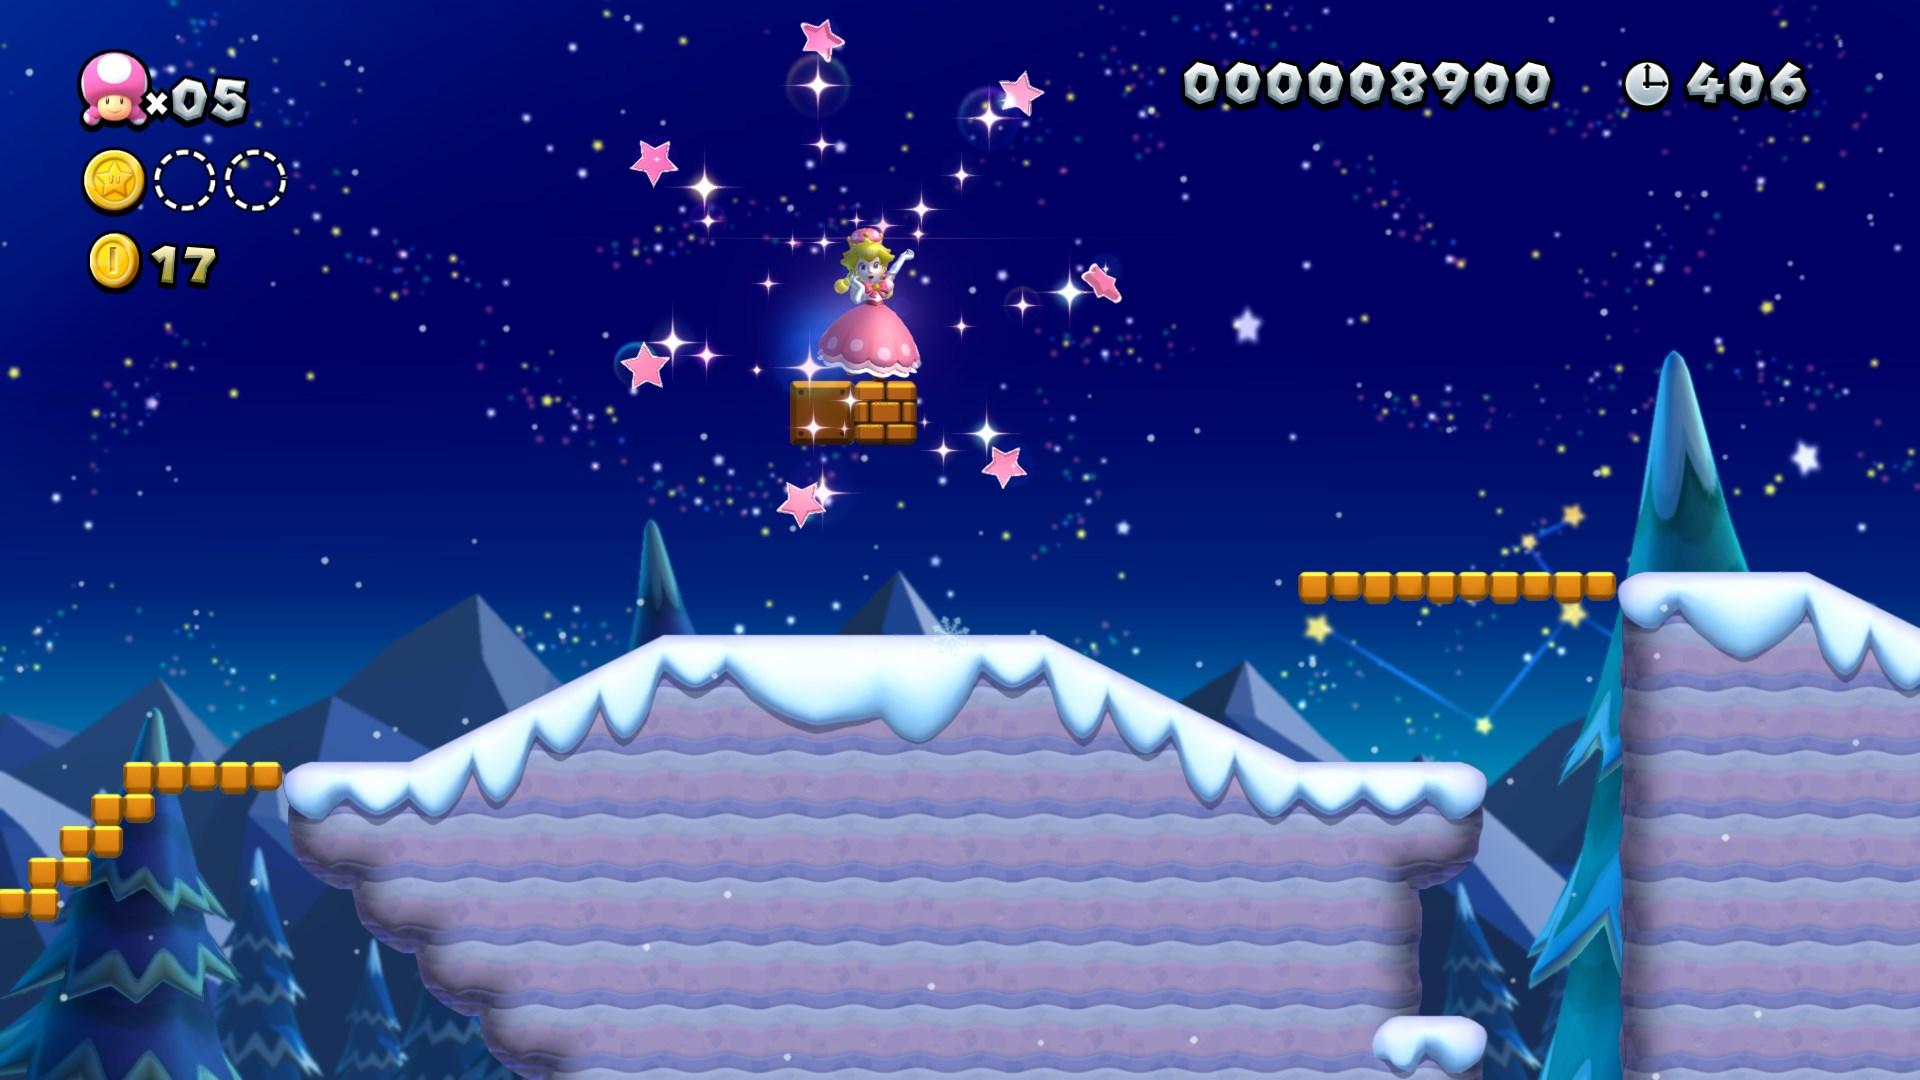 <b>库巴姬梦碎 任天堂确认只有奇诺比姬能戴超级皇冠</b>